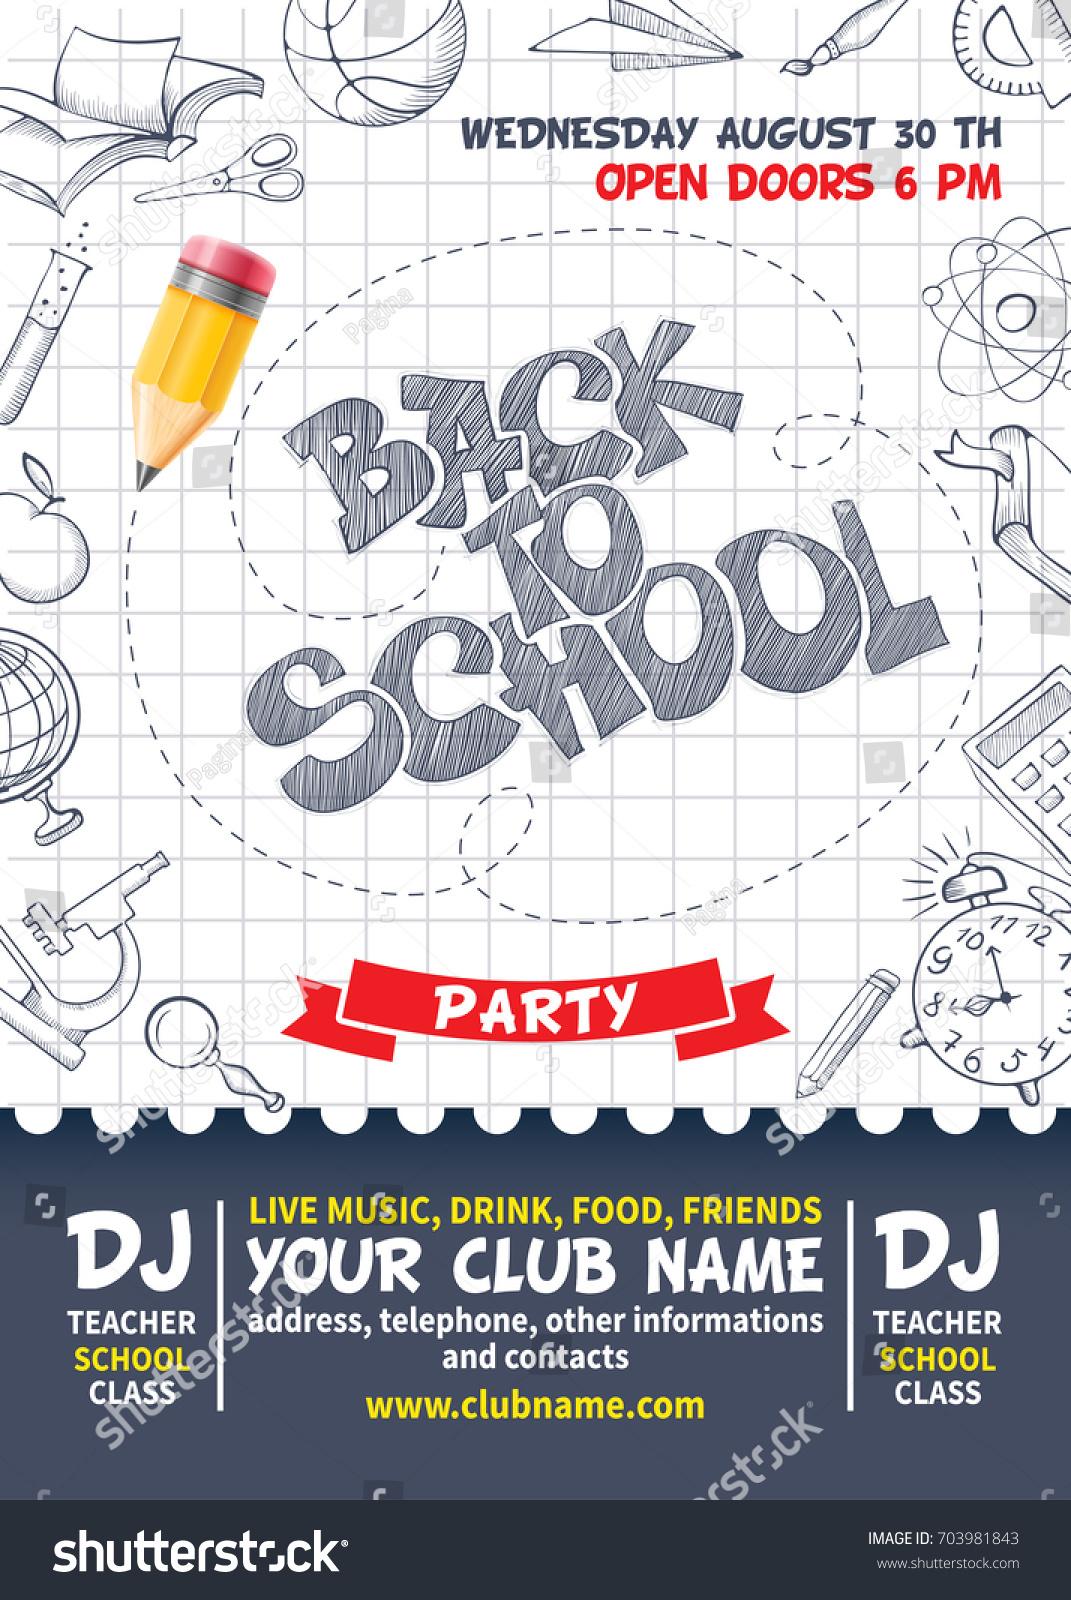 Back School Party Poster Template Design Image Vectorielle De Stock